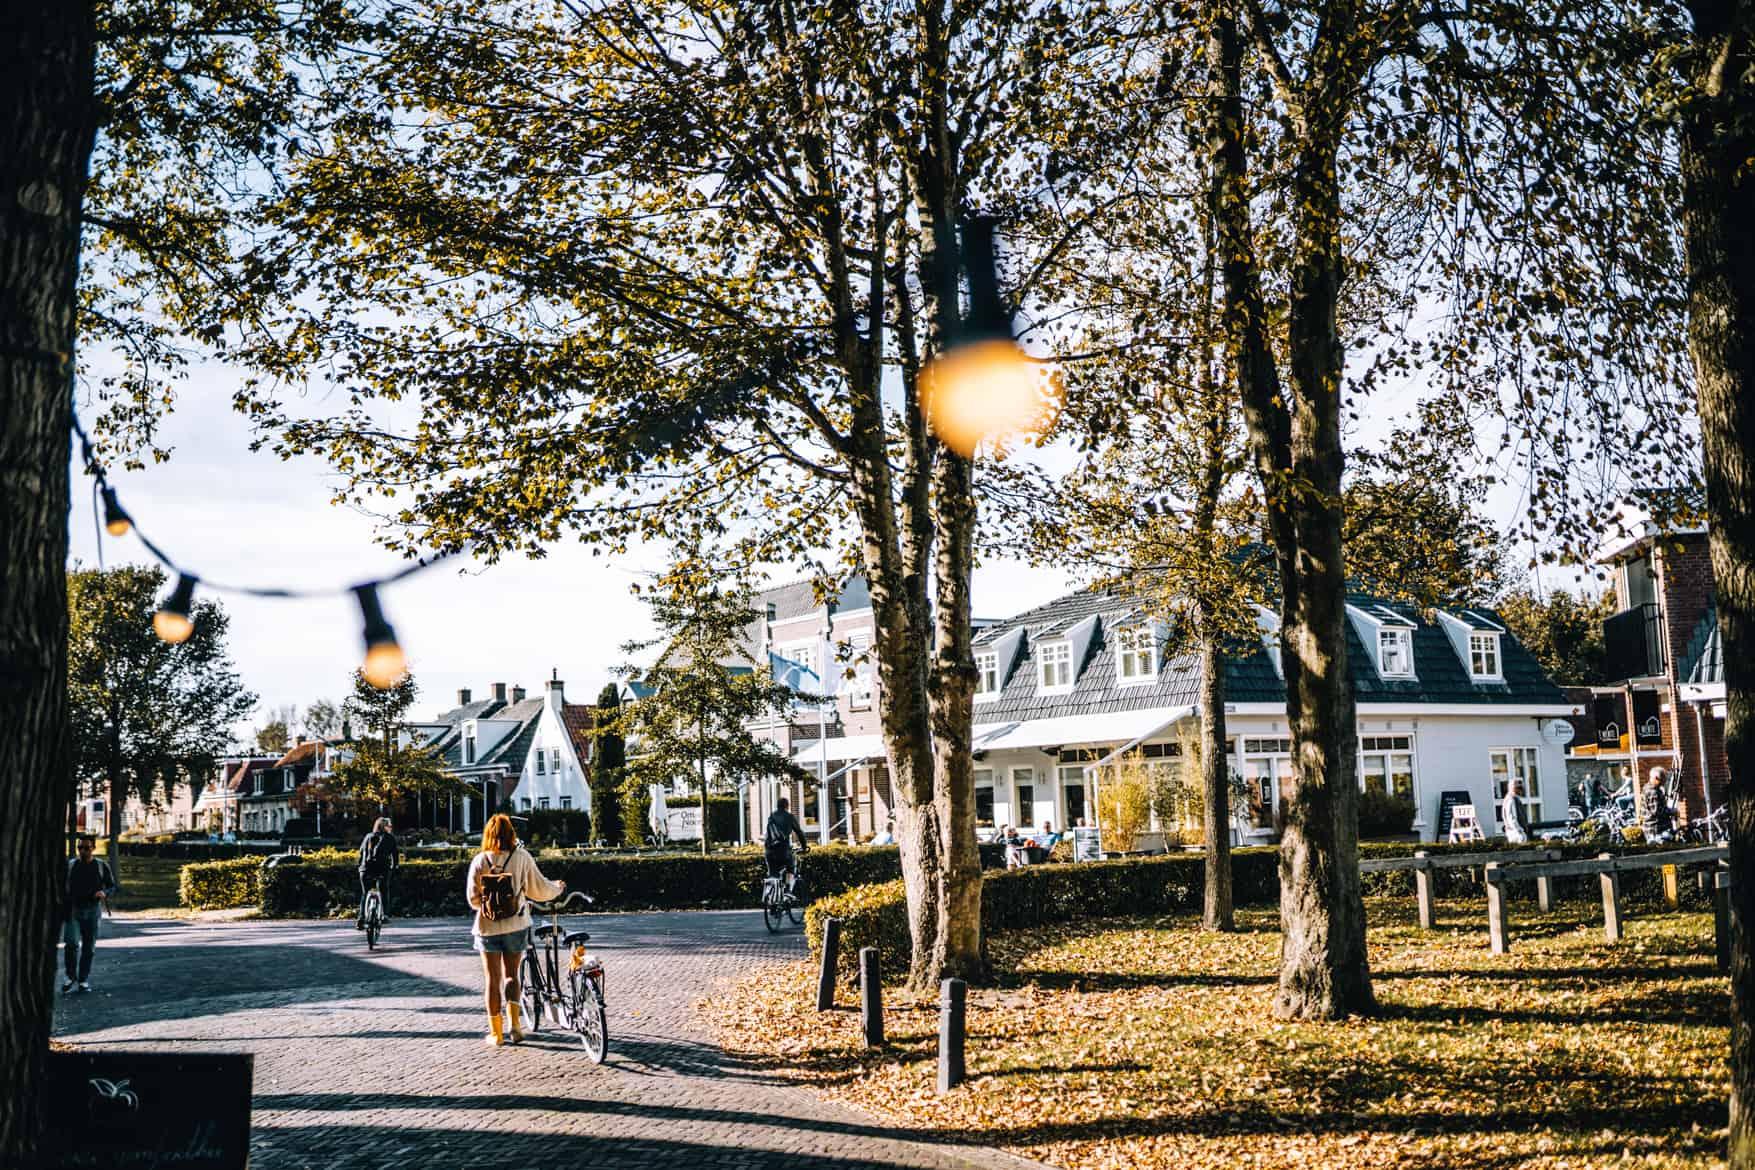 Schiermonnikoog Stadtbummel mit dem Fahrrad